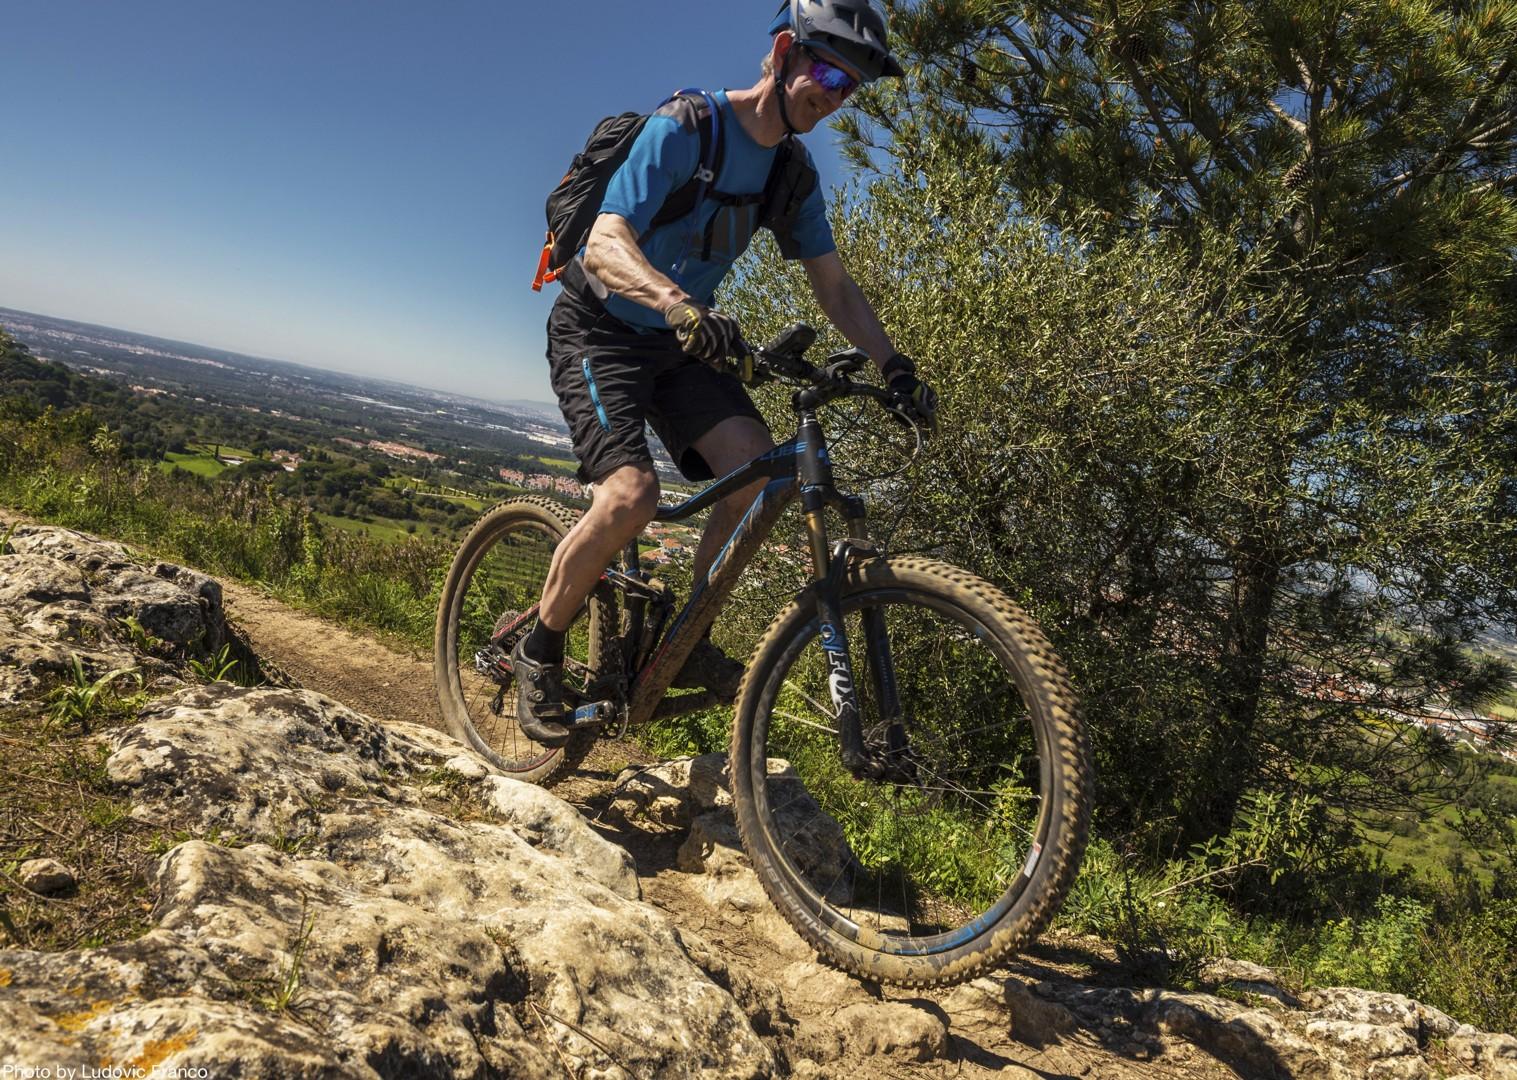 technical-singletrack-terrain-cycling-holiday-portugal.jpg - Portugal - Atlantic Trails - Guided Mountain Bike Holiday - Mountain Biking